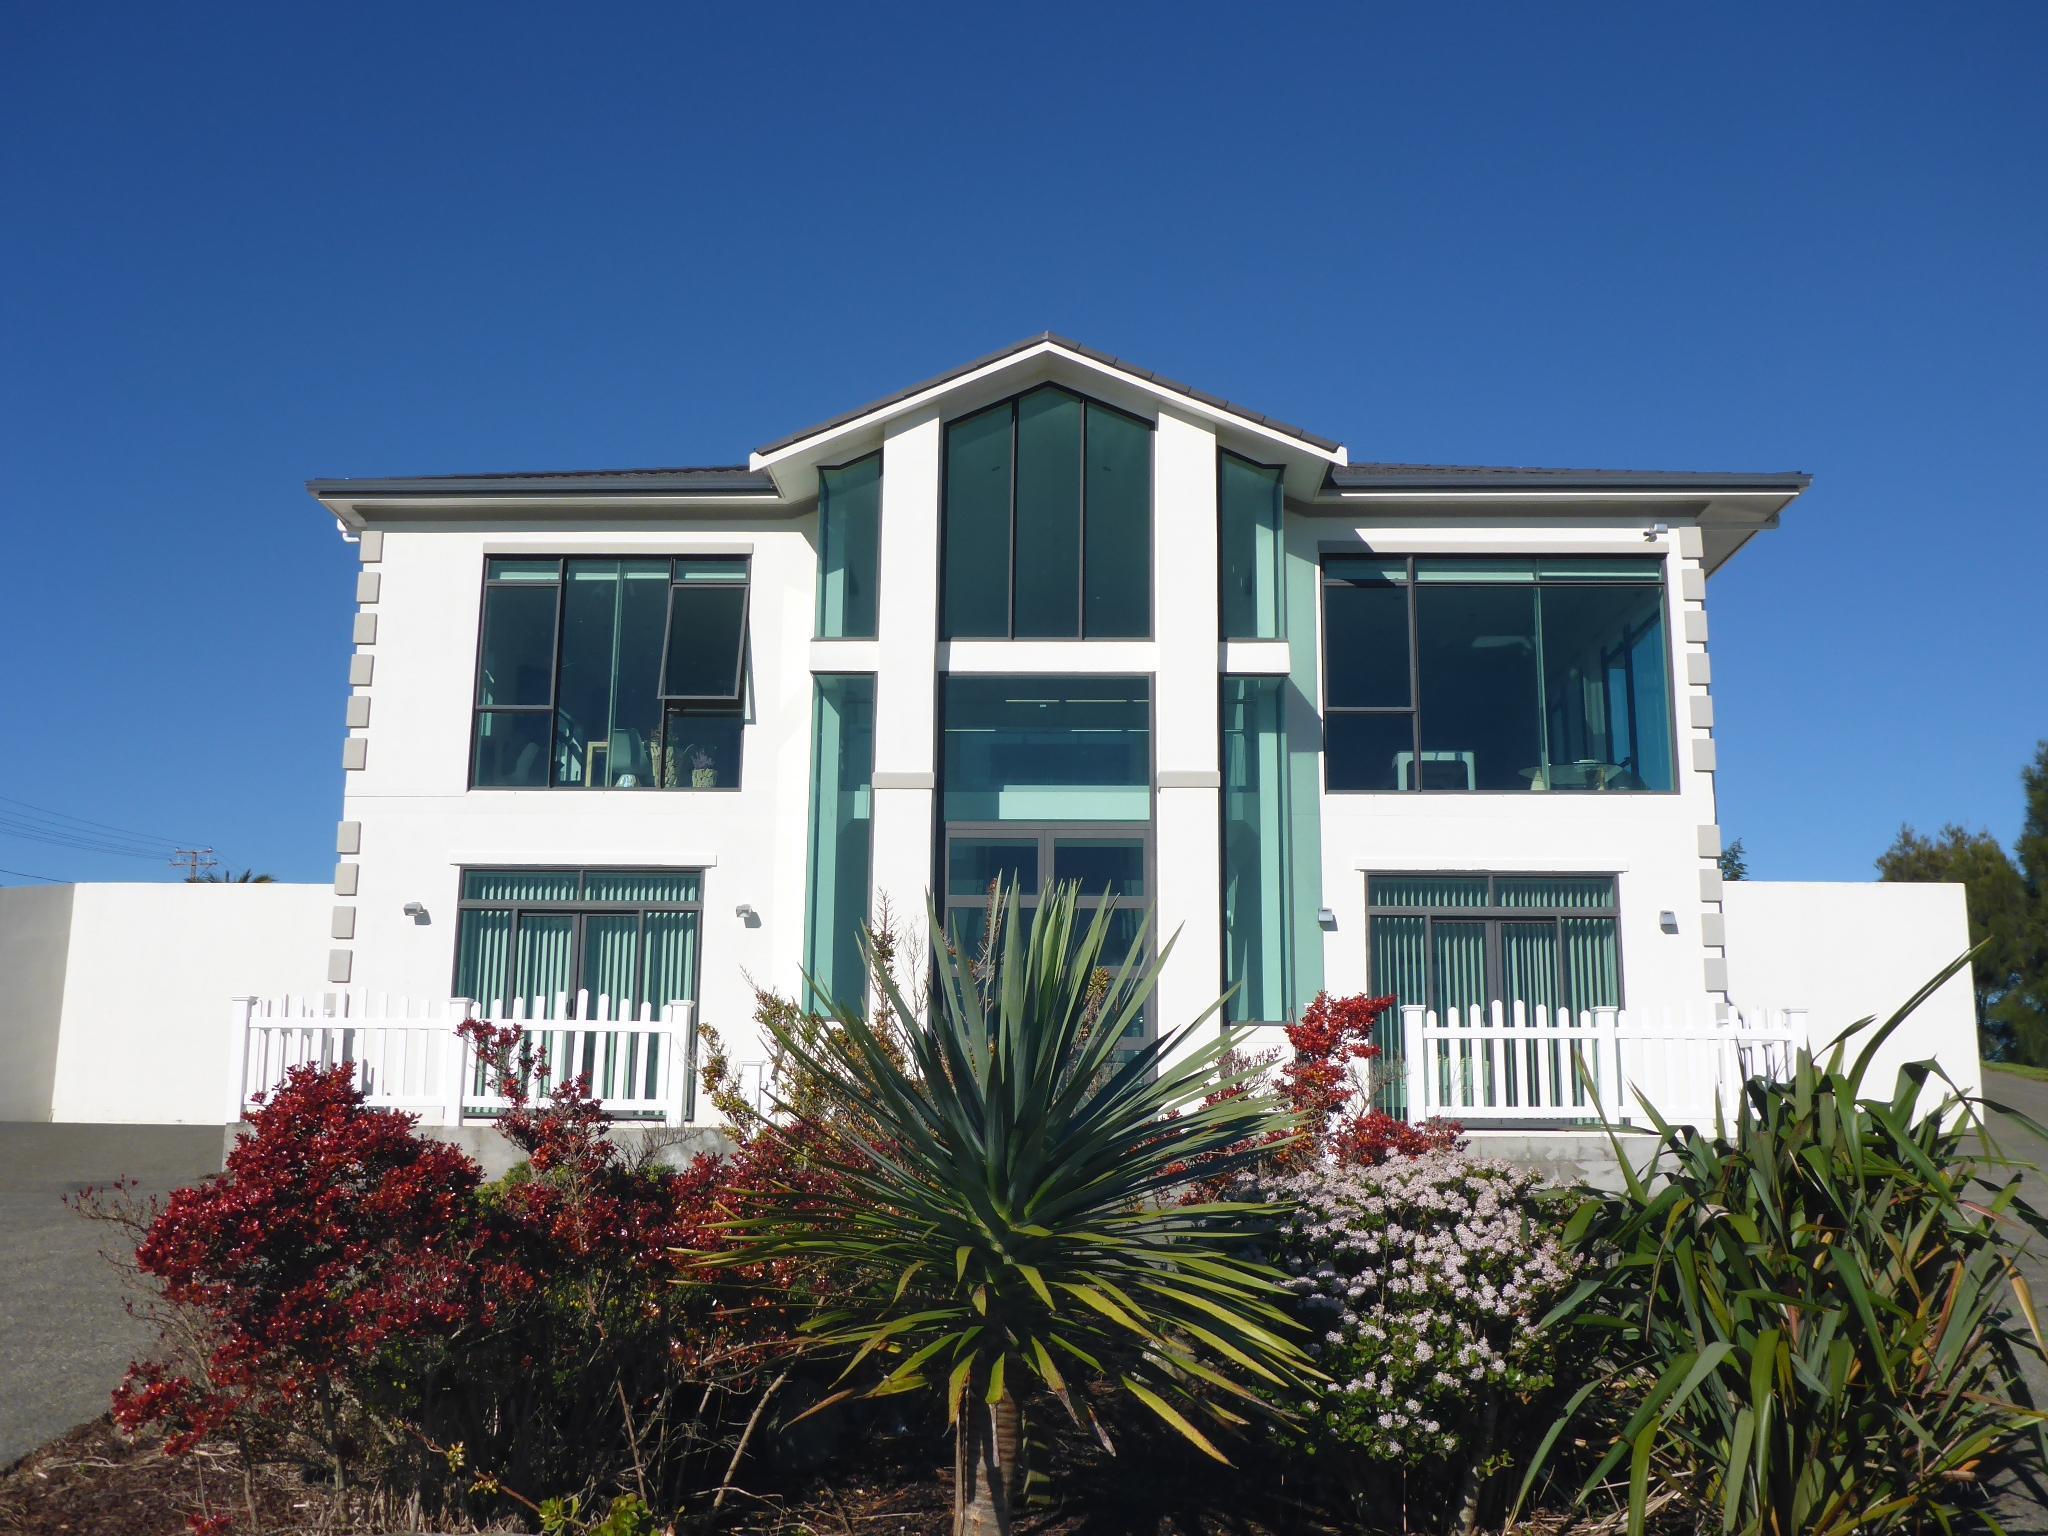 Silverdale Hilltop Lodge